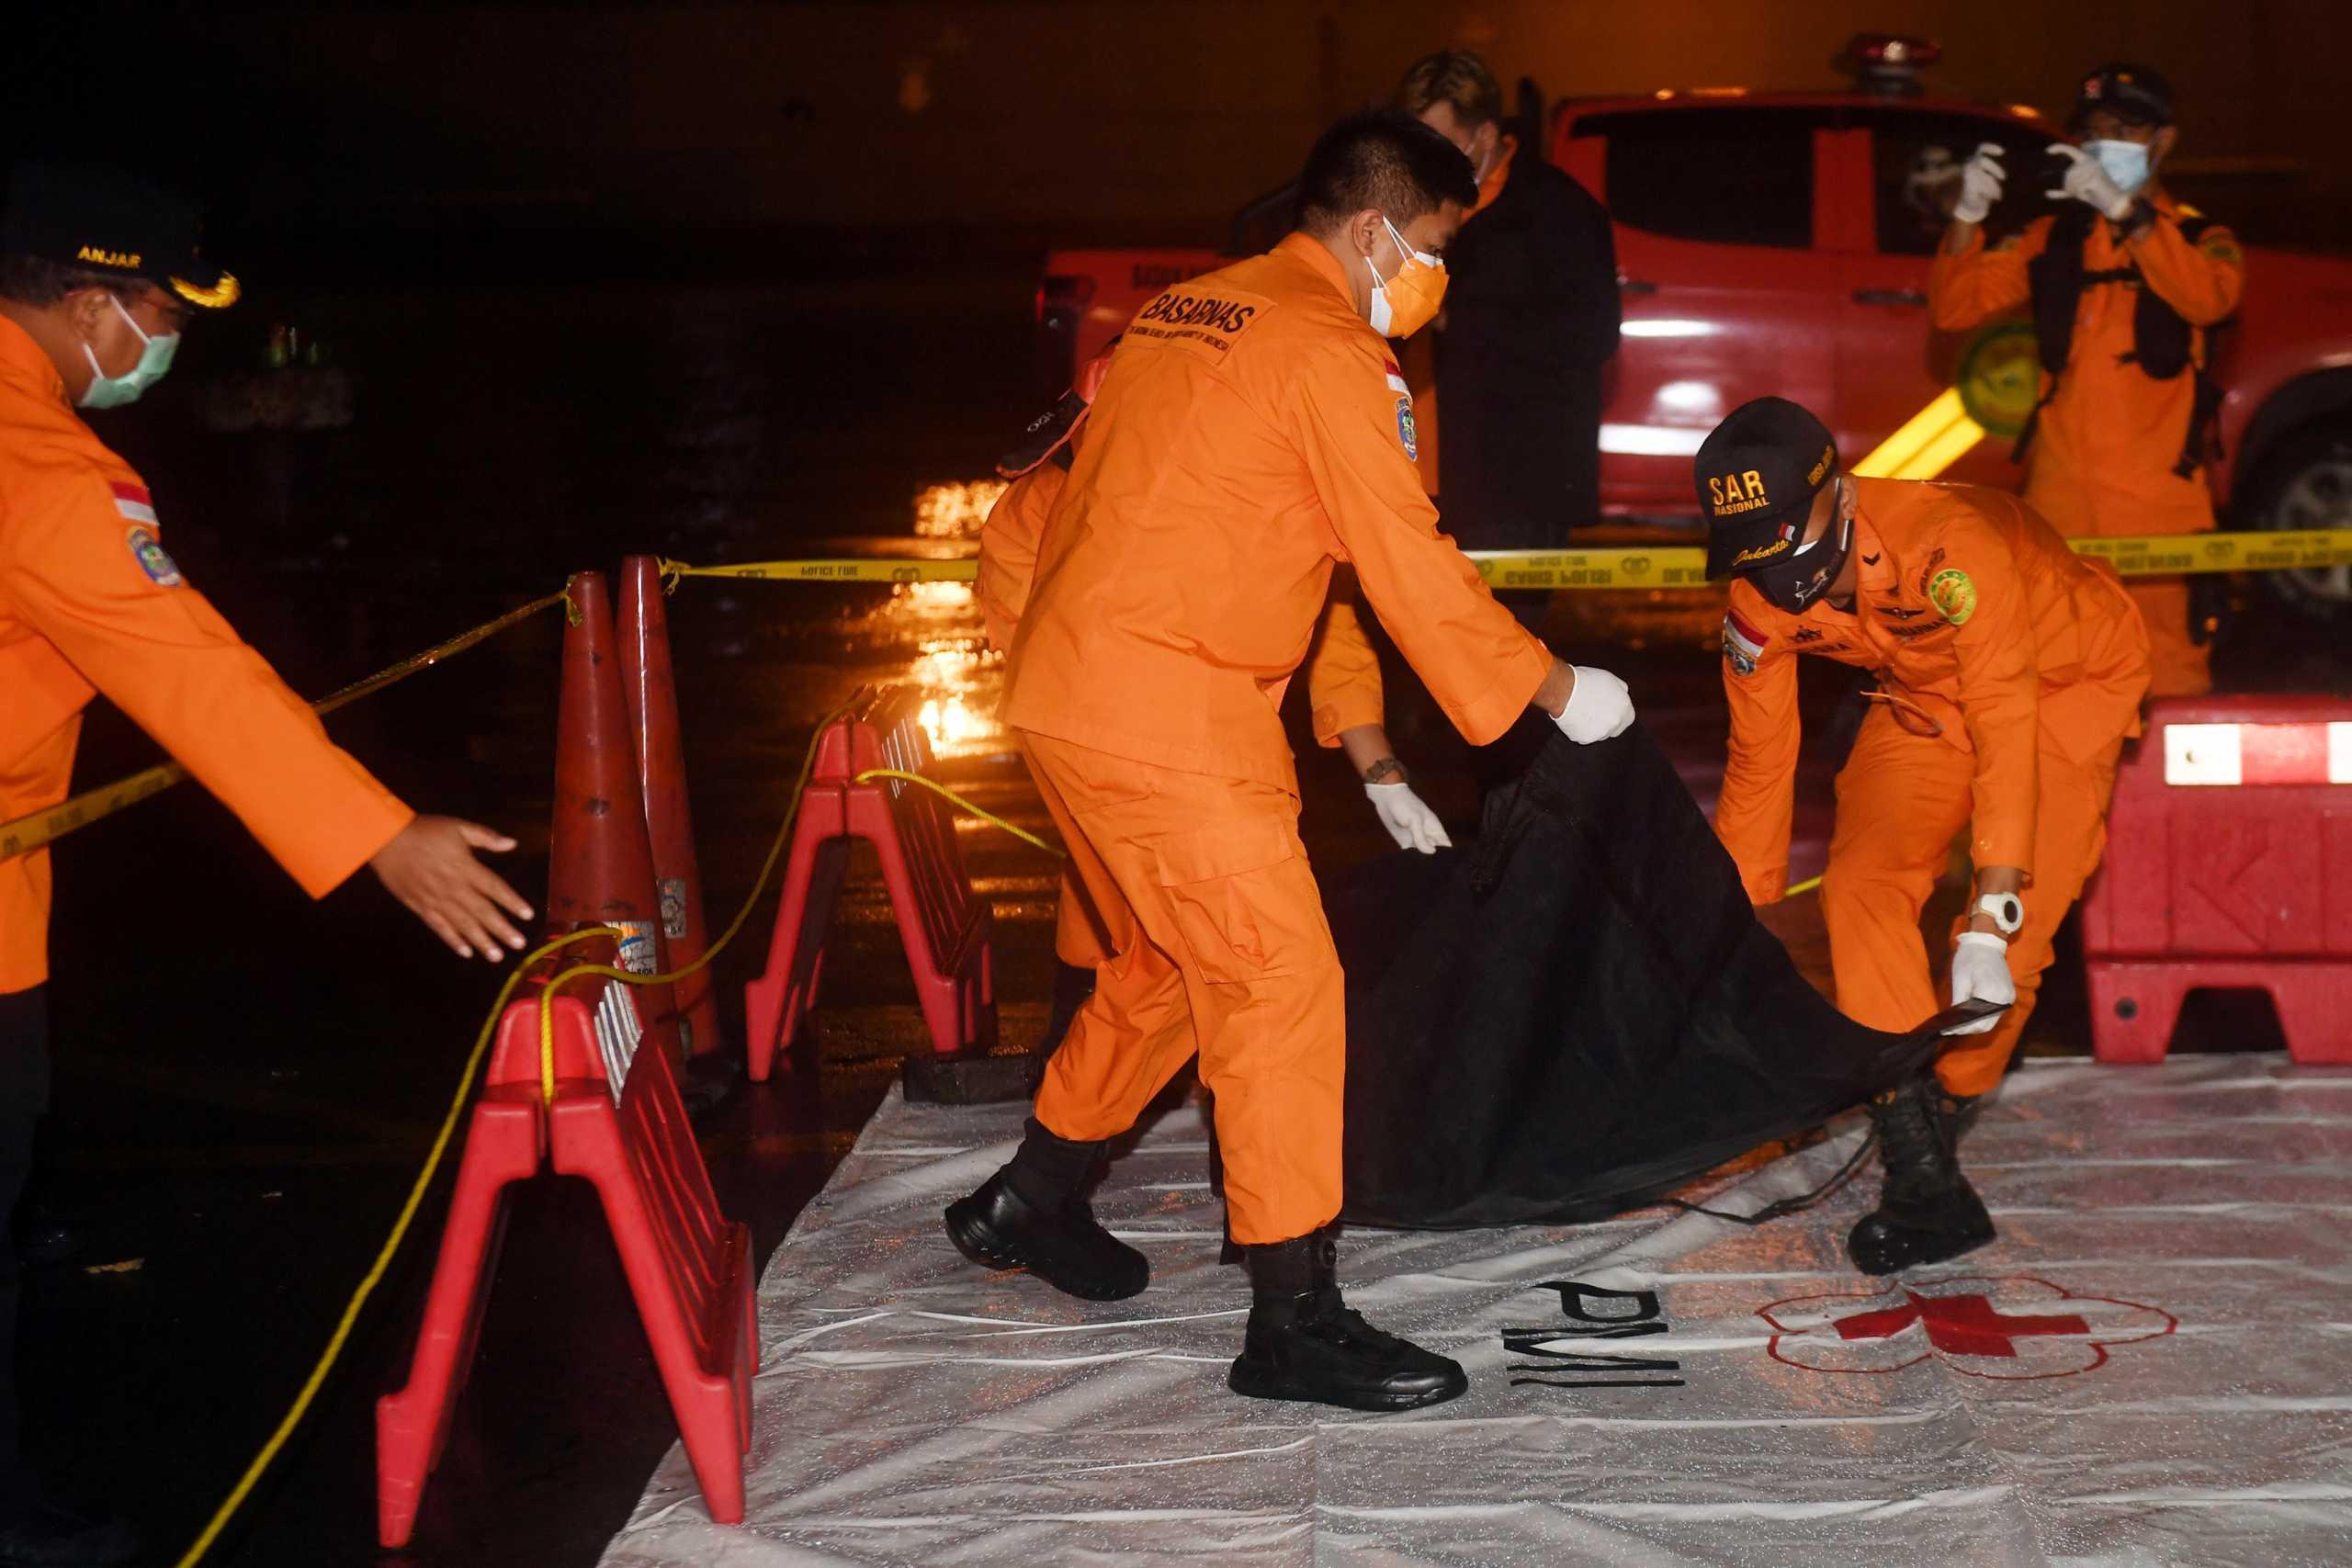 Boeing: Ειδικό εγχειρίδιο προς τους πιλότους μετά την τραγωδία της Sriwijaya Air